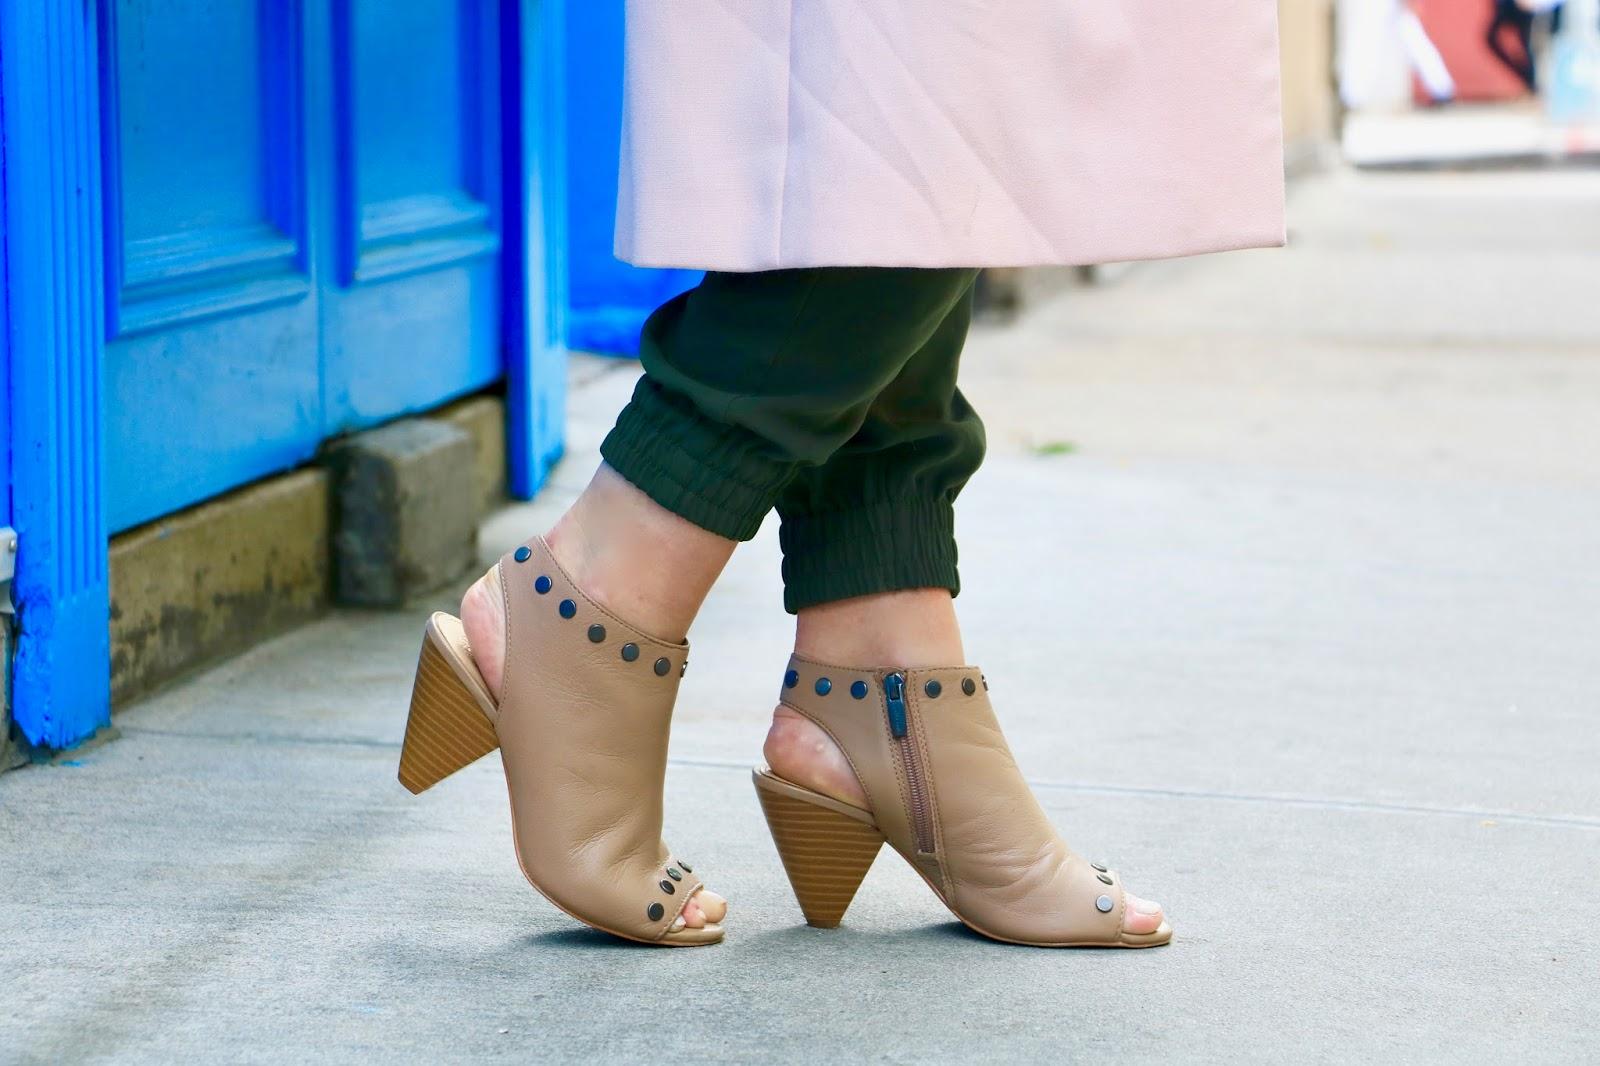 Nyc fashion blogger Kathleen Harper in nude peep-toe booties